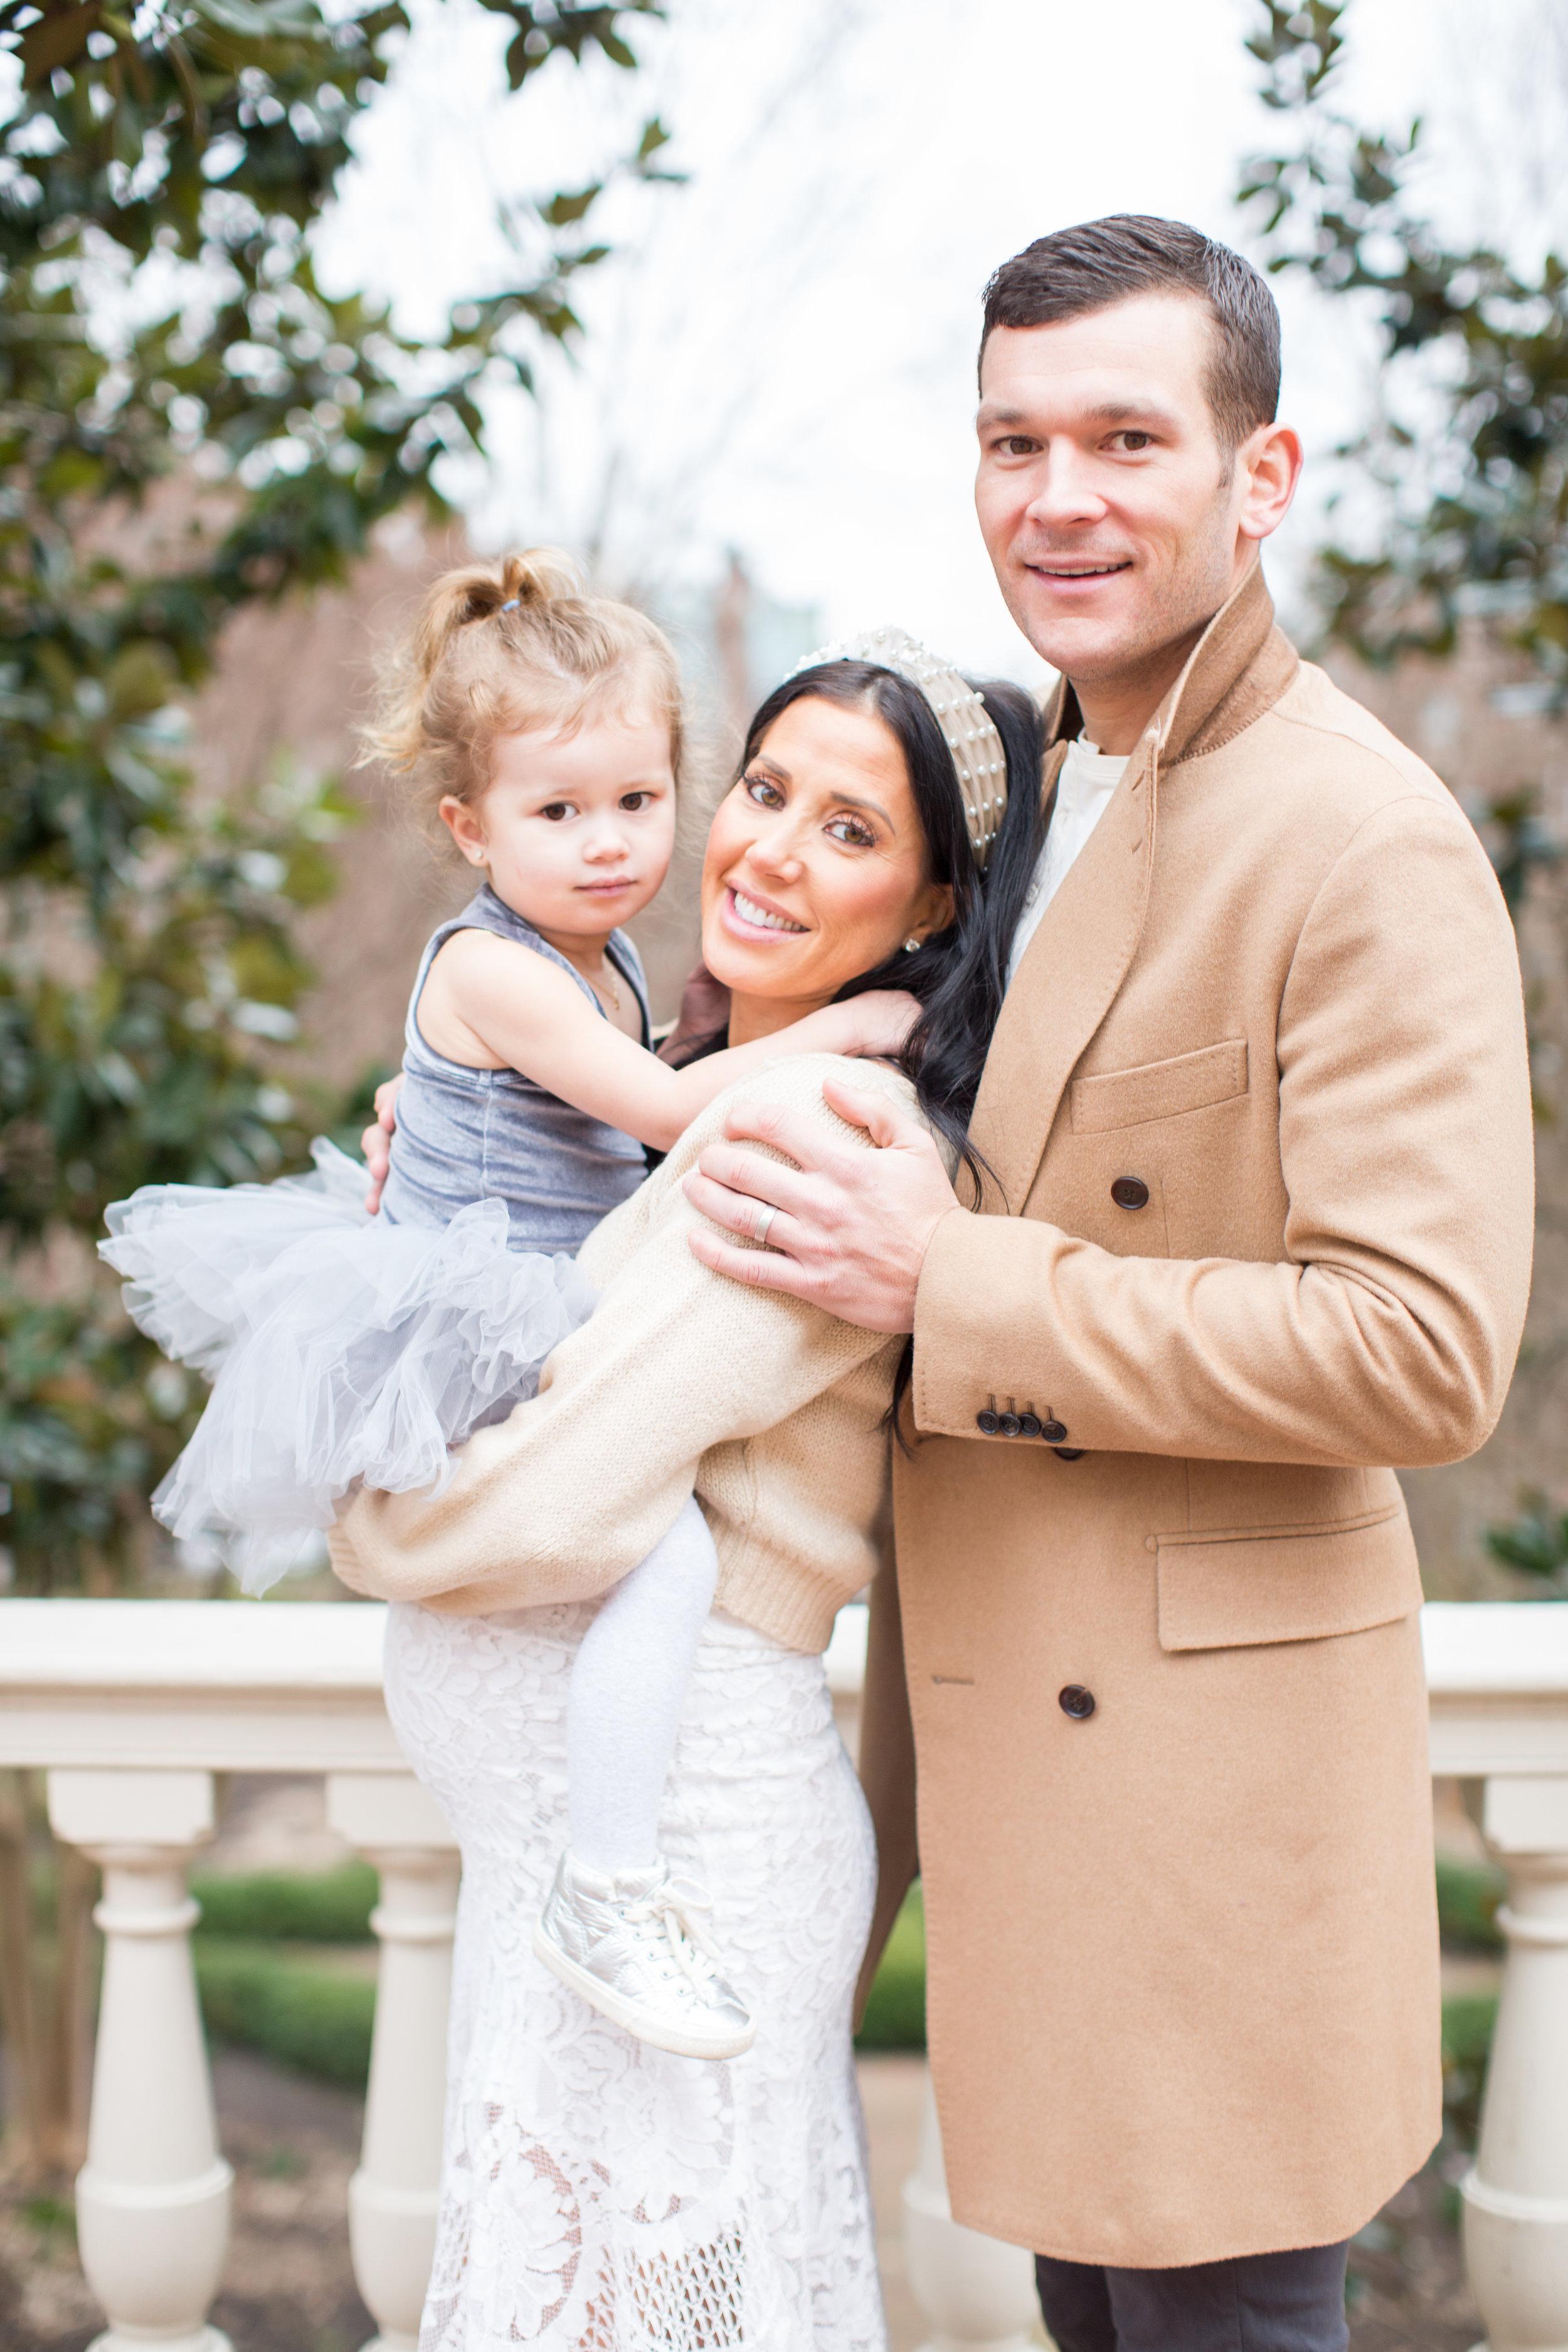 Maternity Family Photo Shoot DC Photographer Jessica Burdge_NatalieStrahorn_4